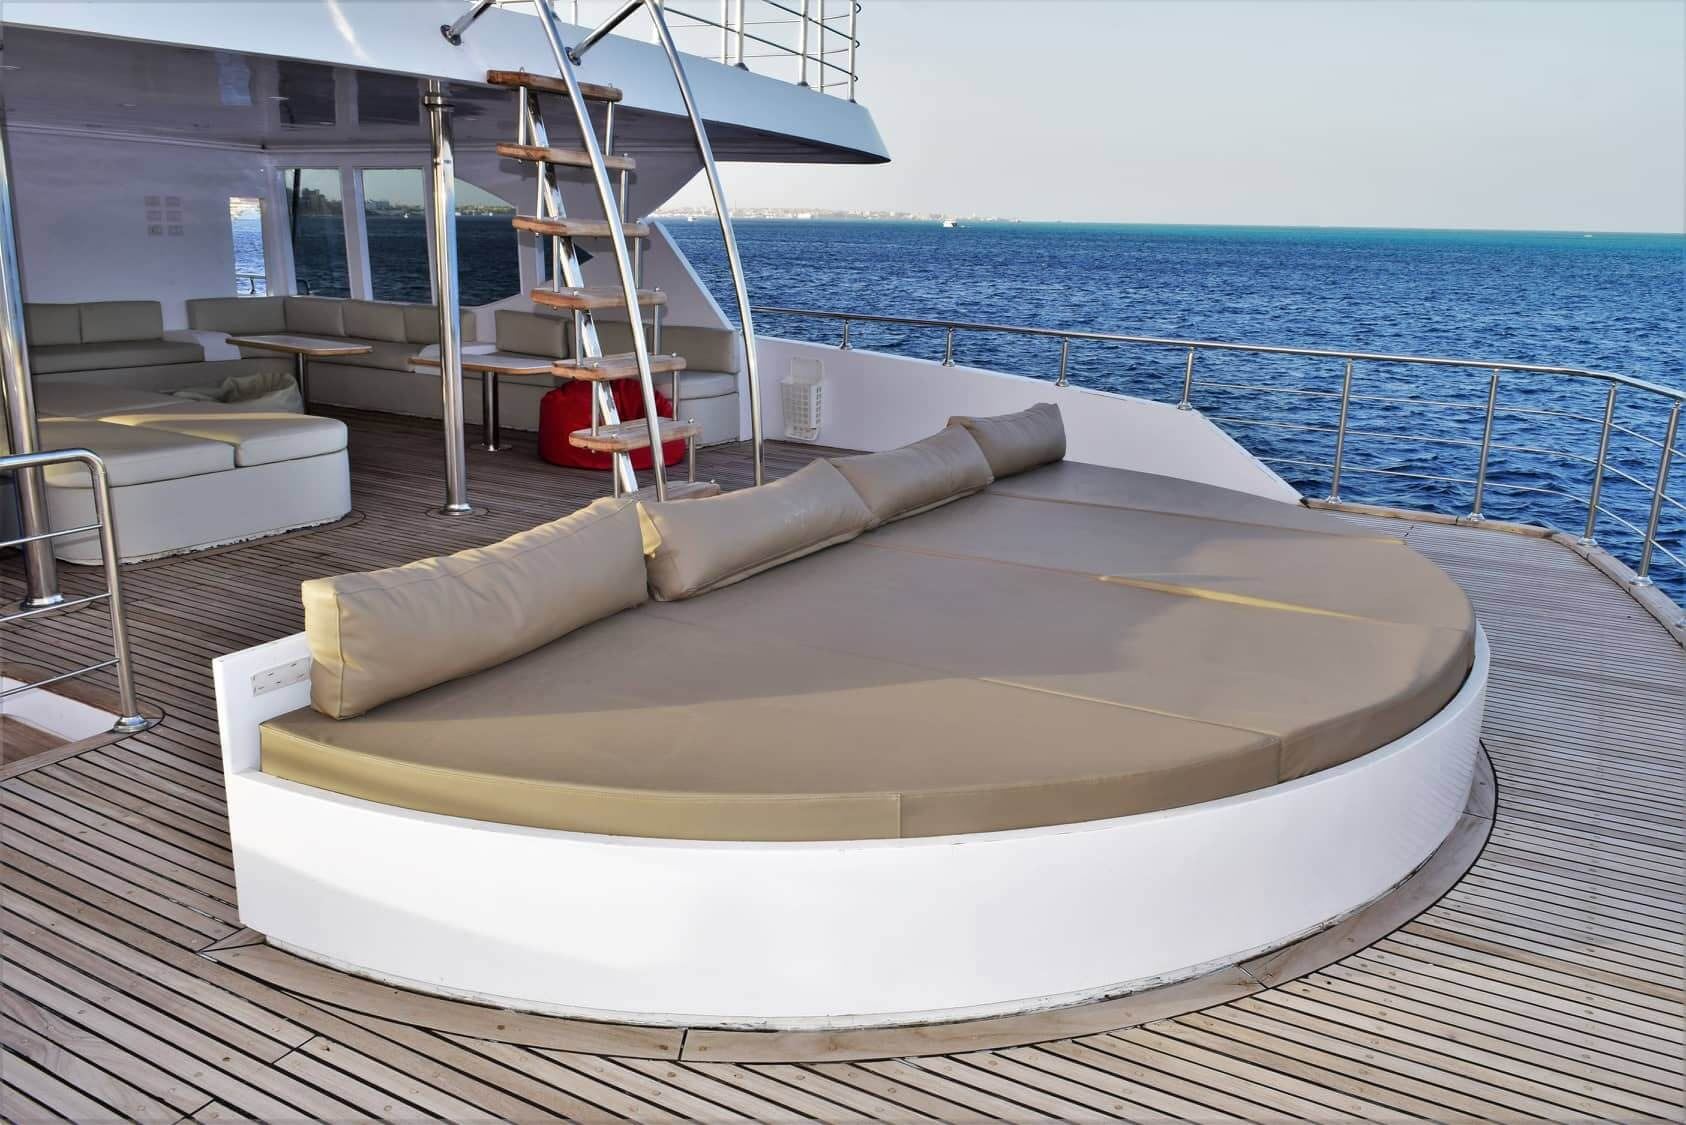 Egypt-REDSEA-Hurghada-DivePro-Academy-Scuba-Diving-Center-Safari-Boat-Roof2